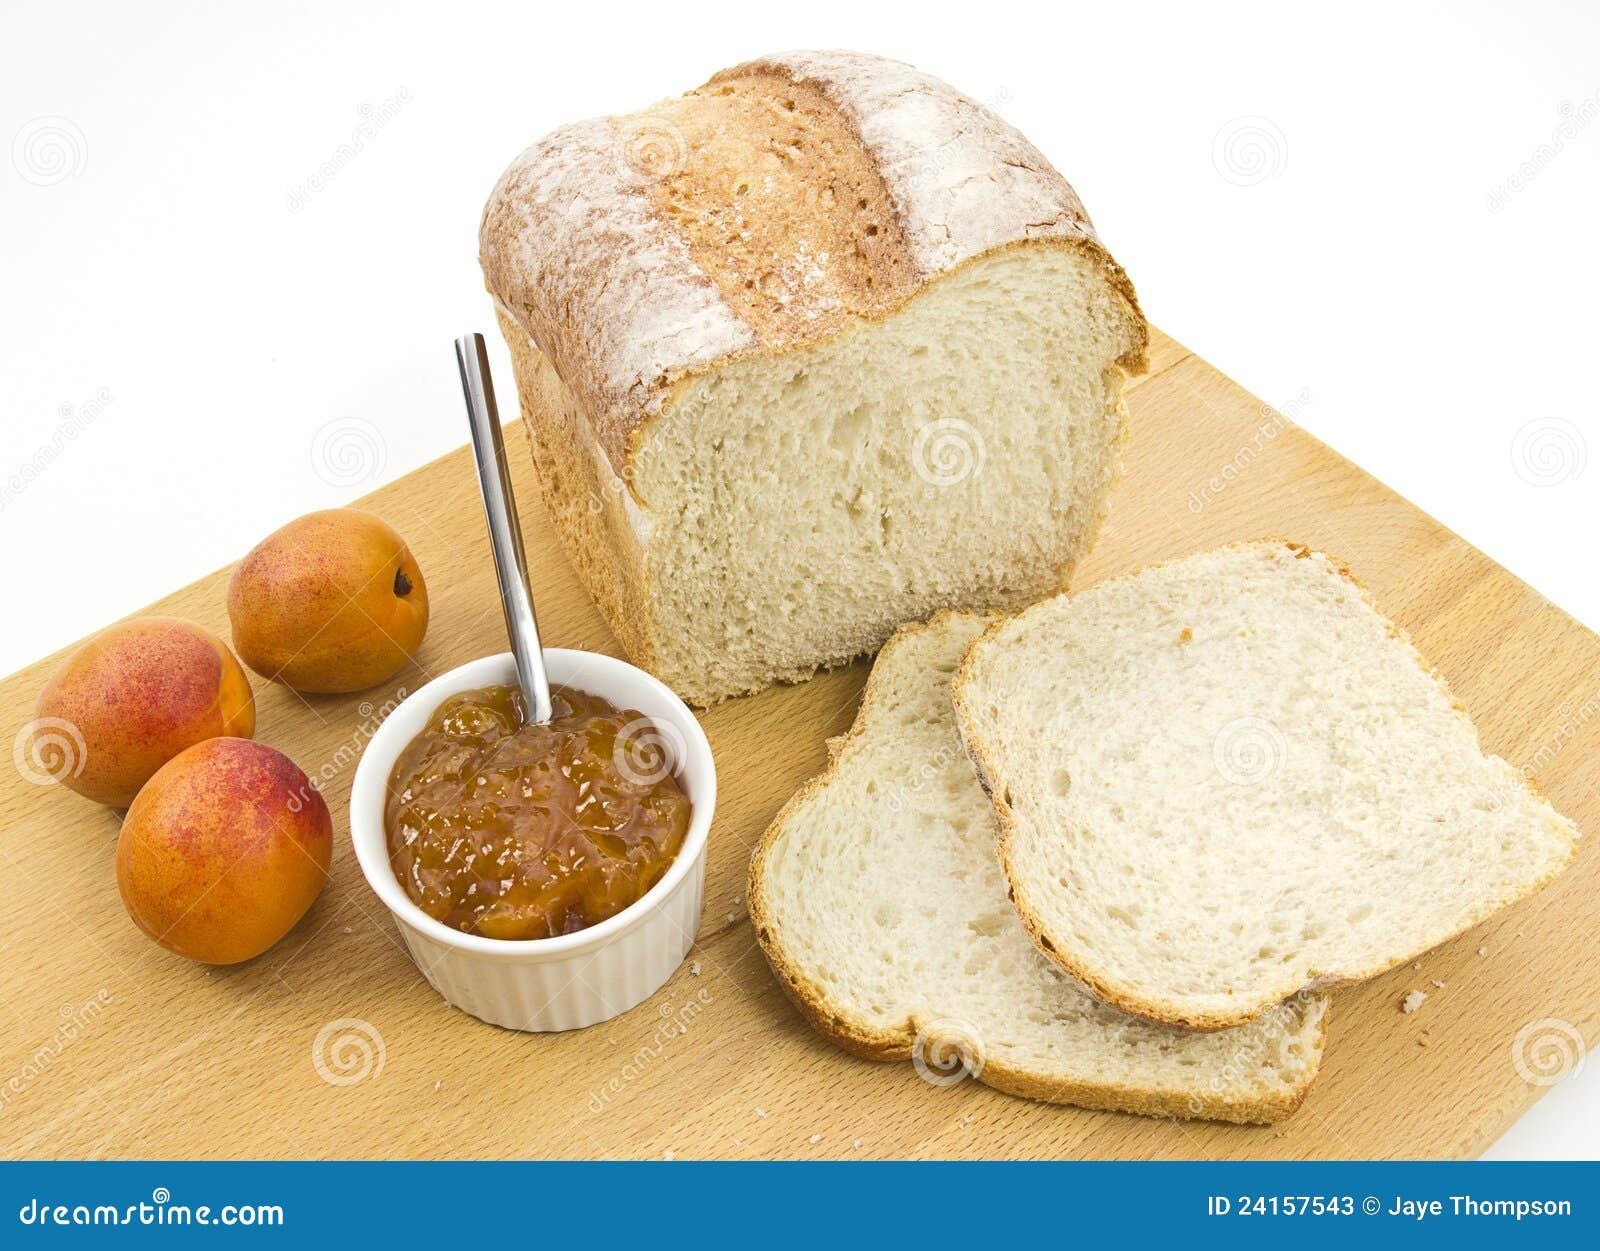 how to cut fresh homemade bread